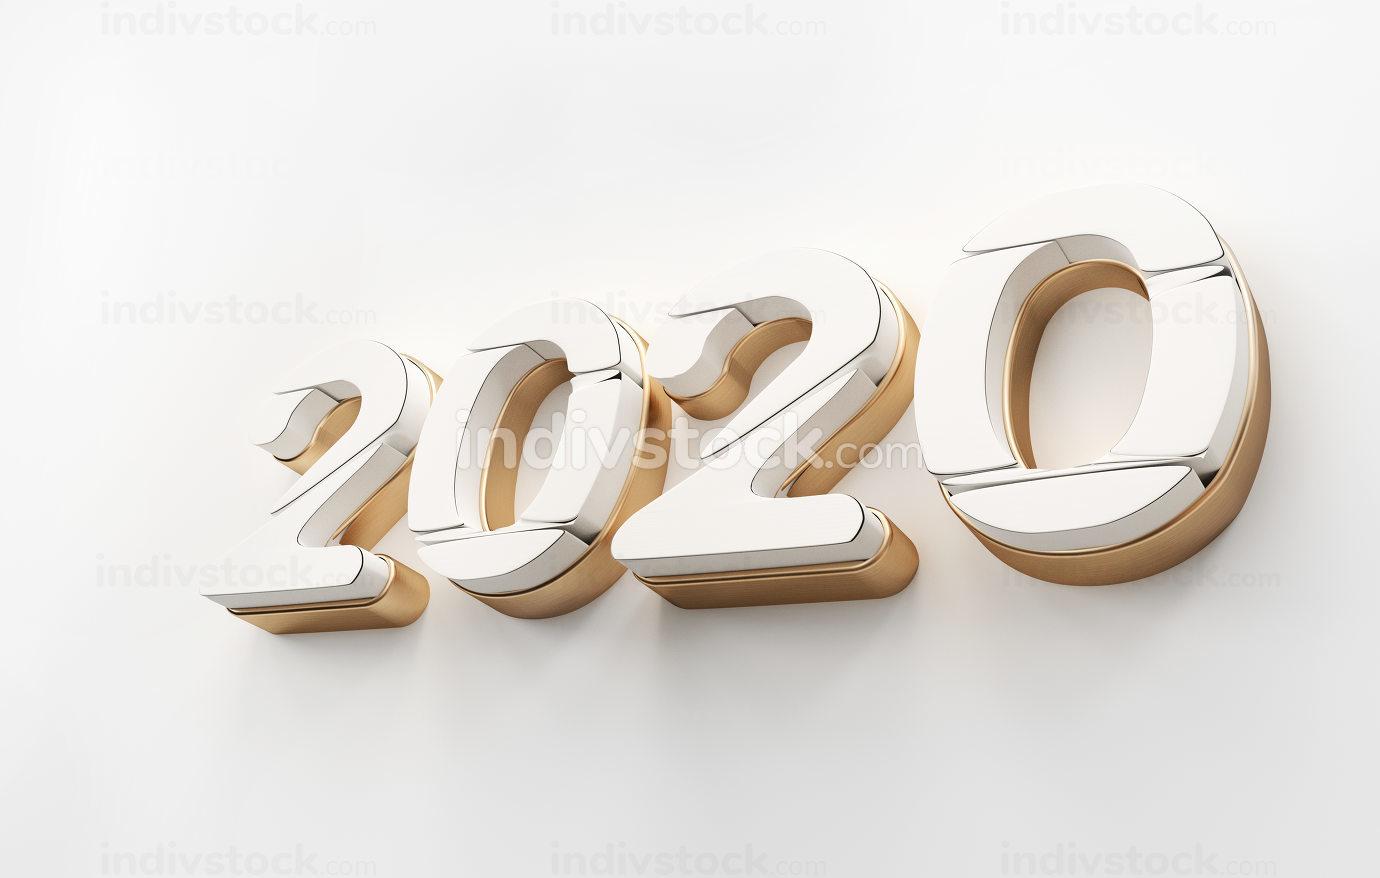 free download: 2020 golden white bold letters 3d-illustration